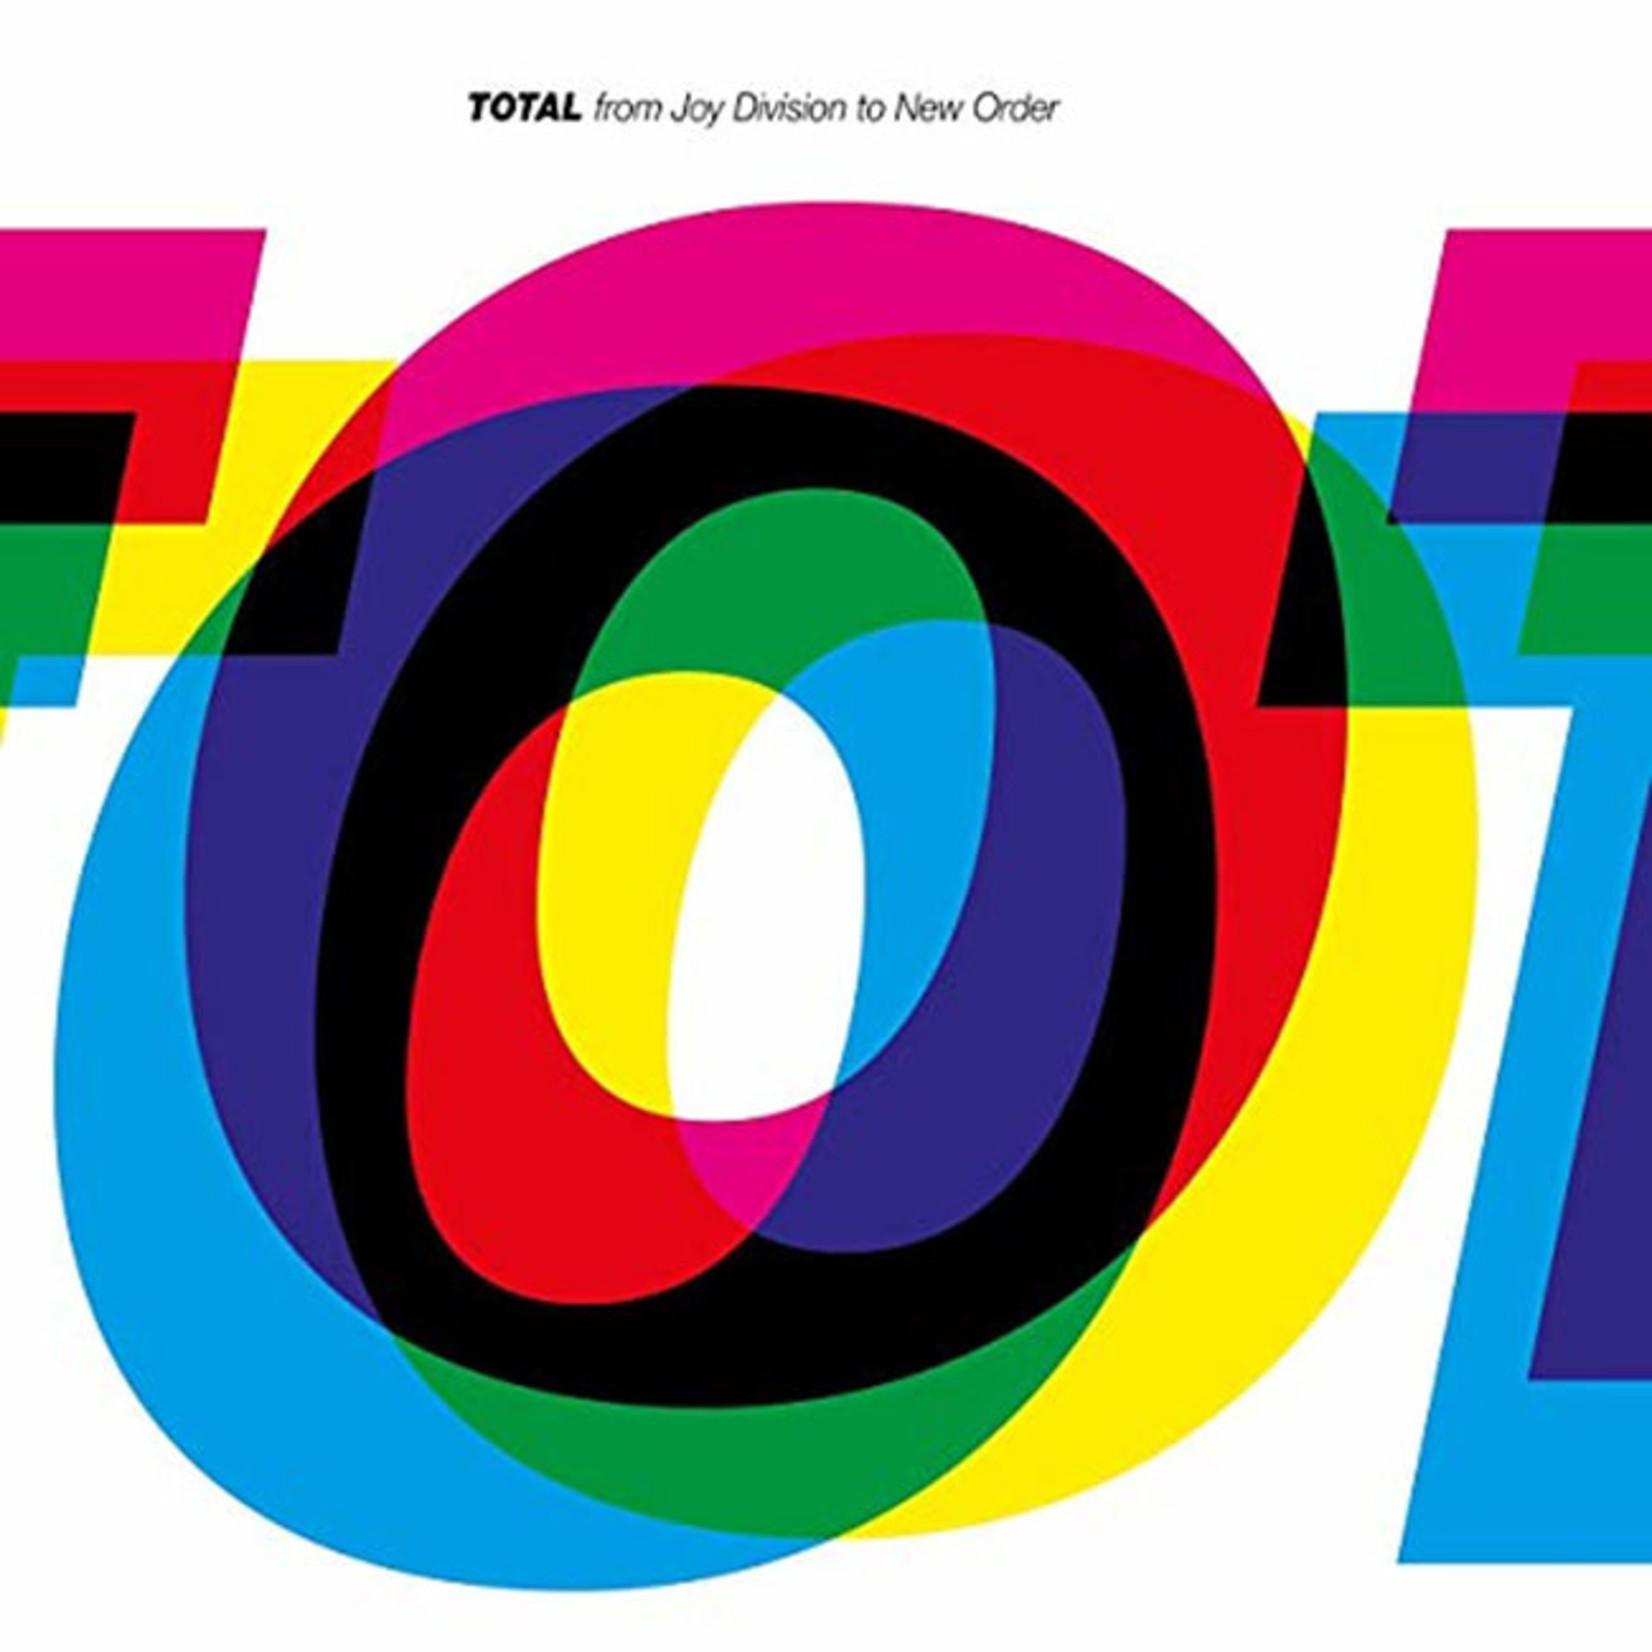 [New] New Order / Joy Division: Total (2LP)